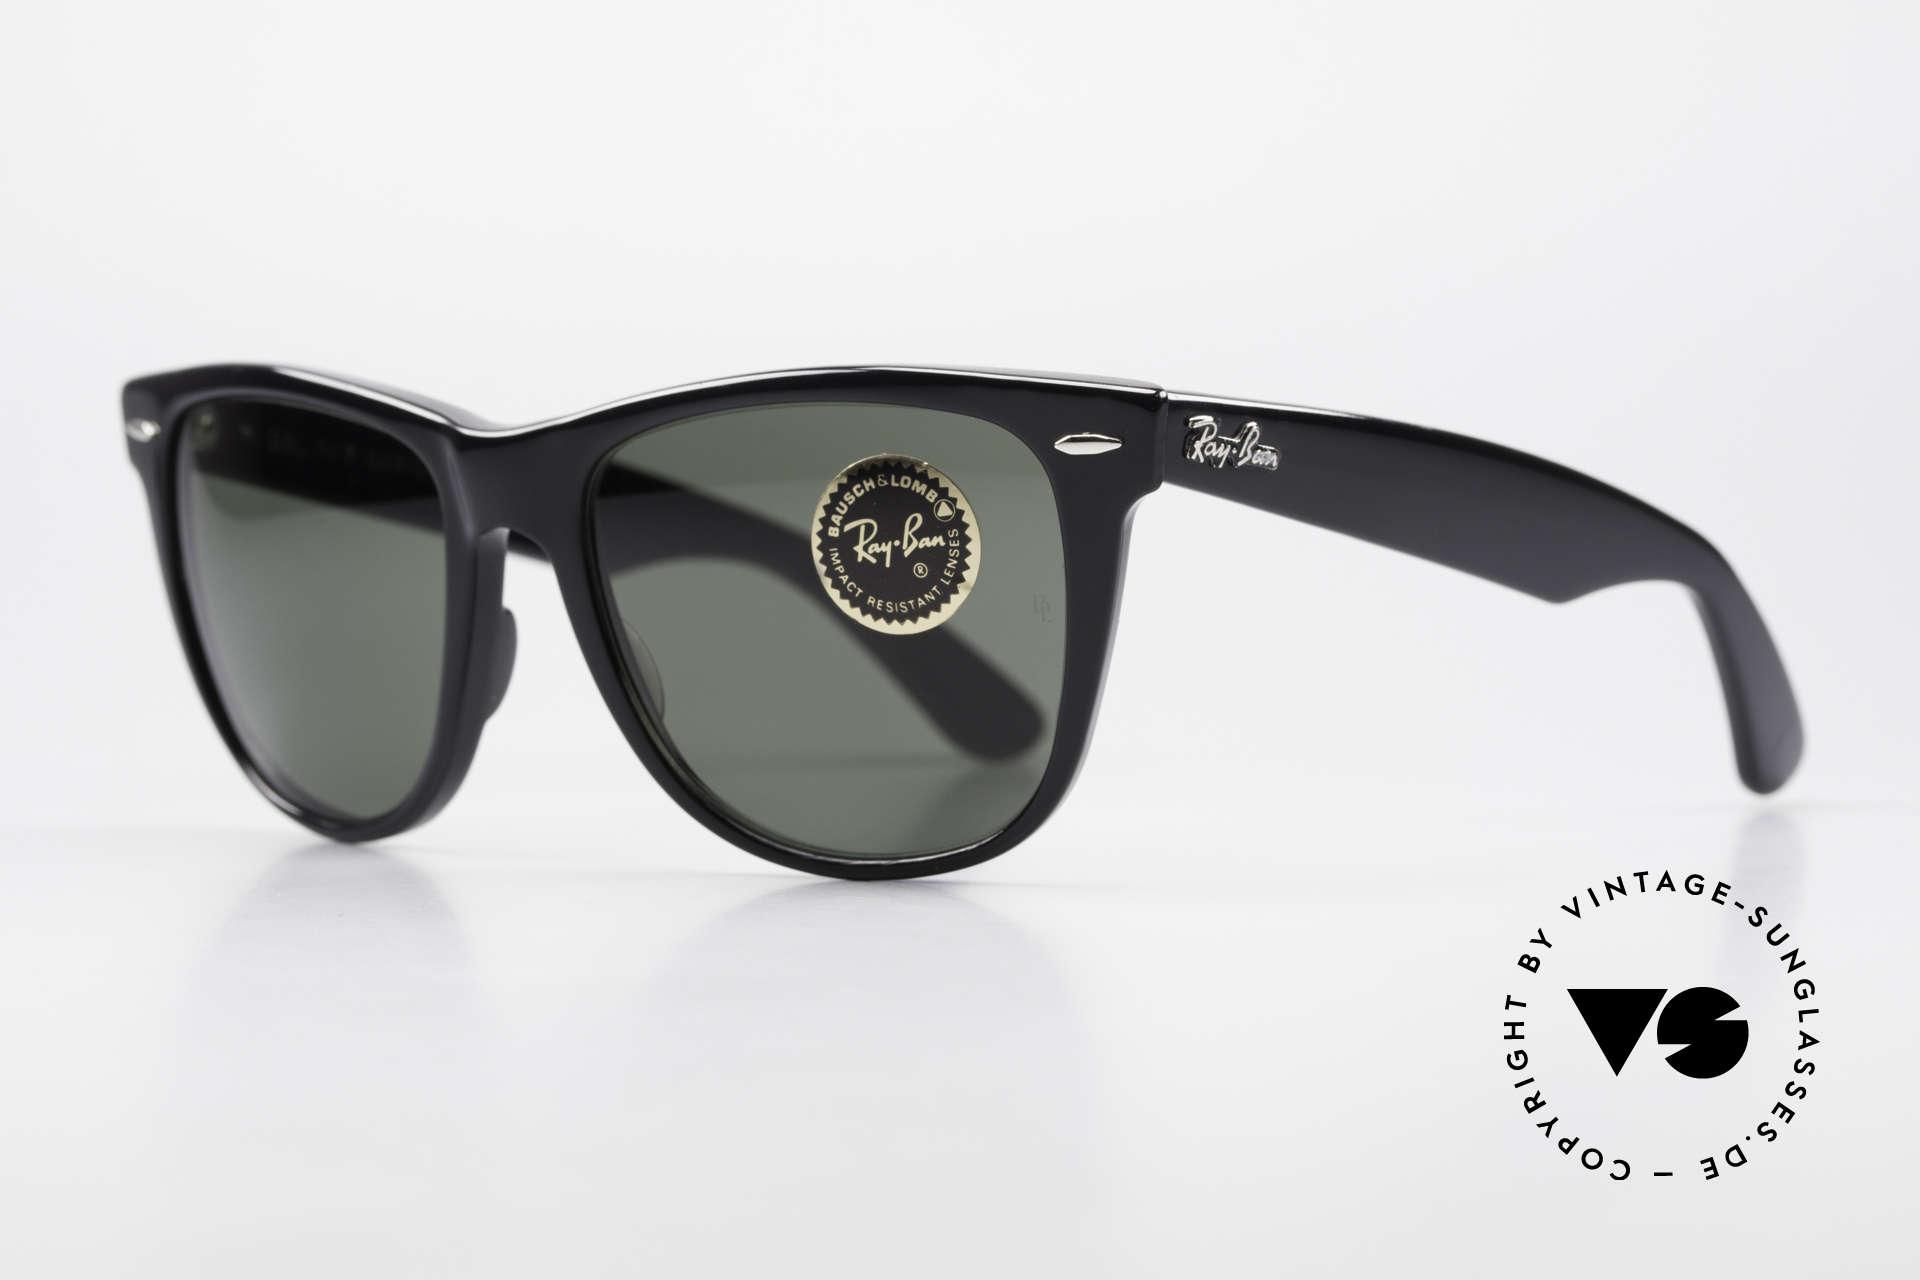 Ray Ban Wayfarer II JFK USA Vintage Sunglasses, original old USA frame (made by Bausch&Lomb), Made for Men